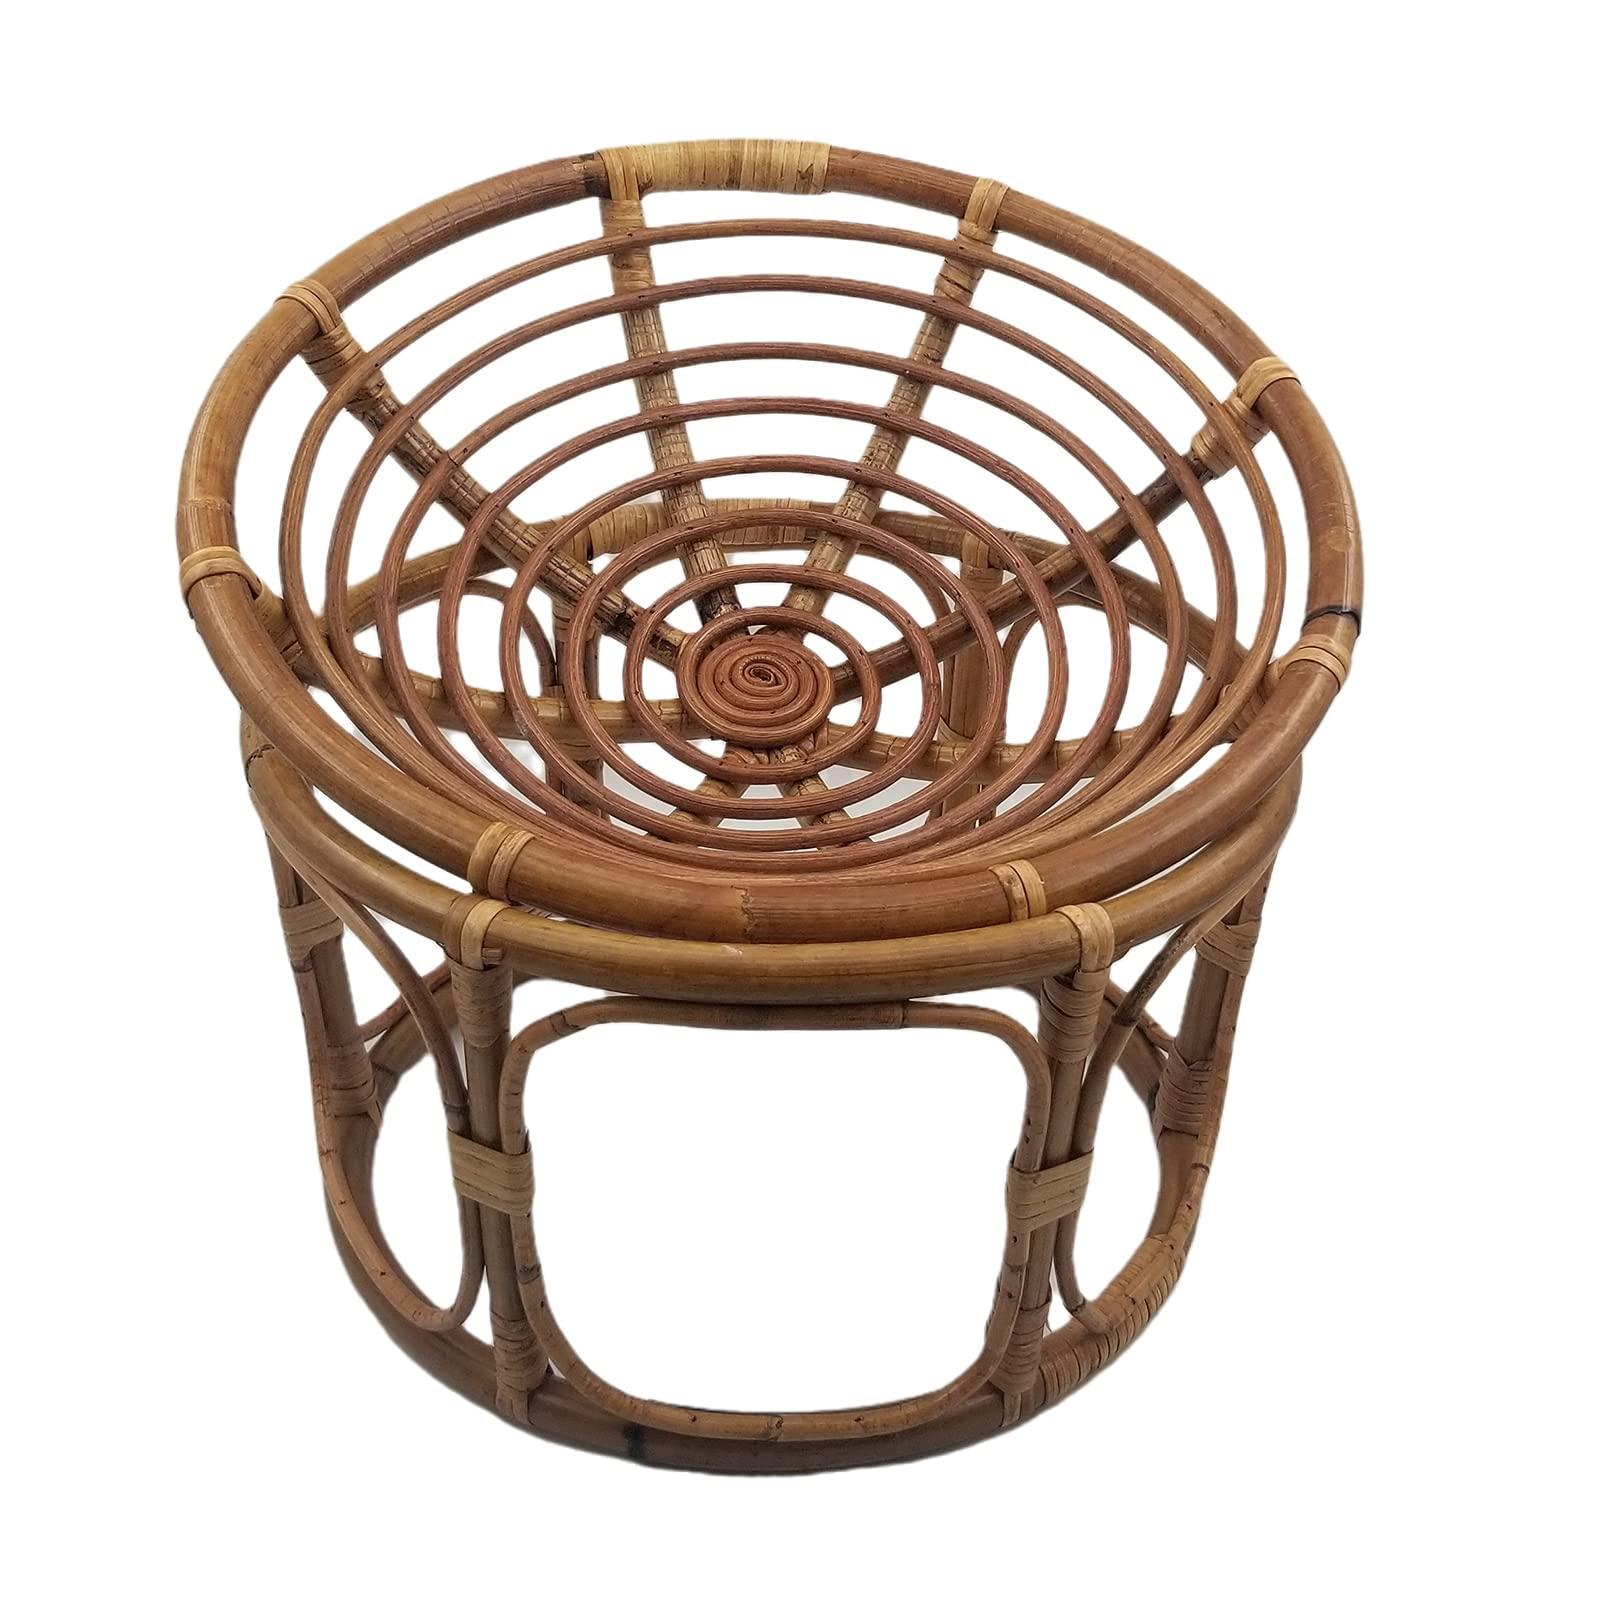 Newborn Photography Props Retro Handmade Rattan Chair Basket Cribs Newborn Photo Shoot Posing Props Photo Studio Accessories